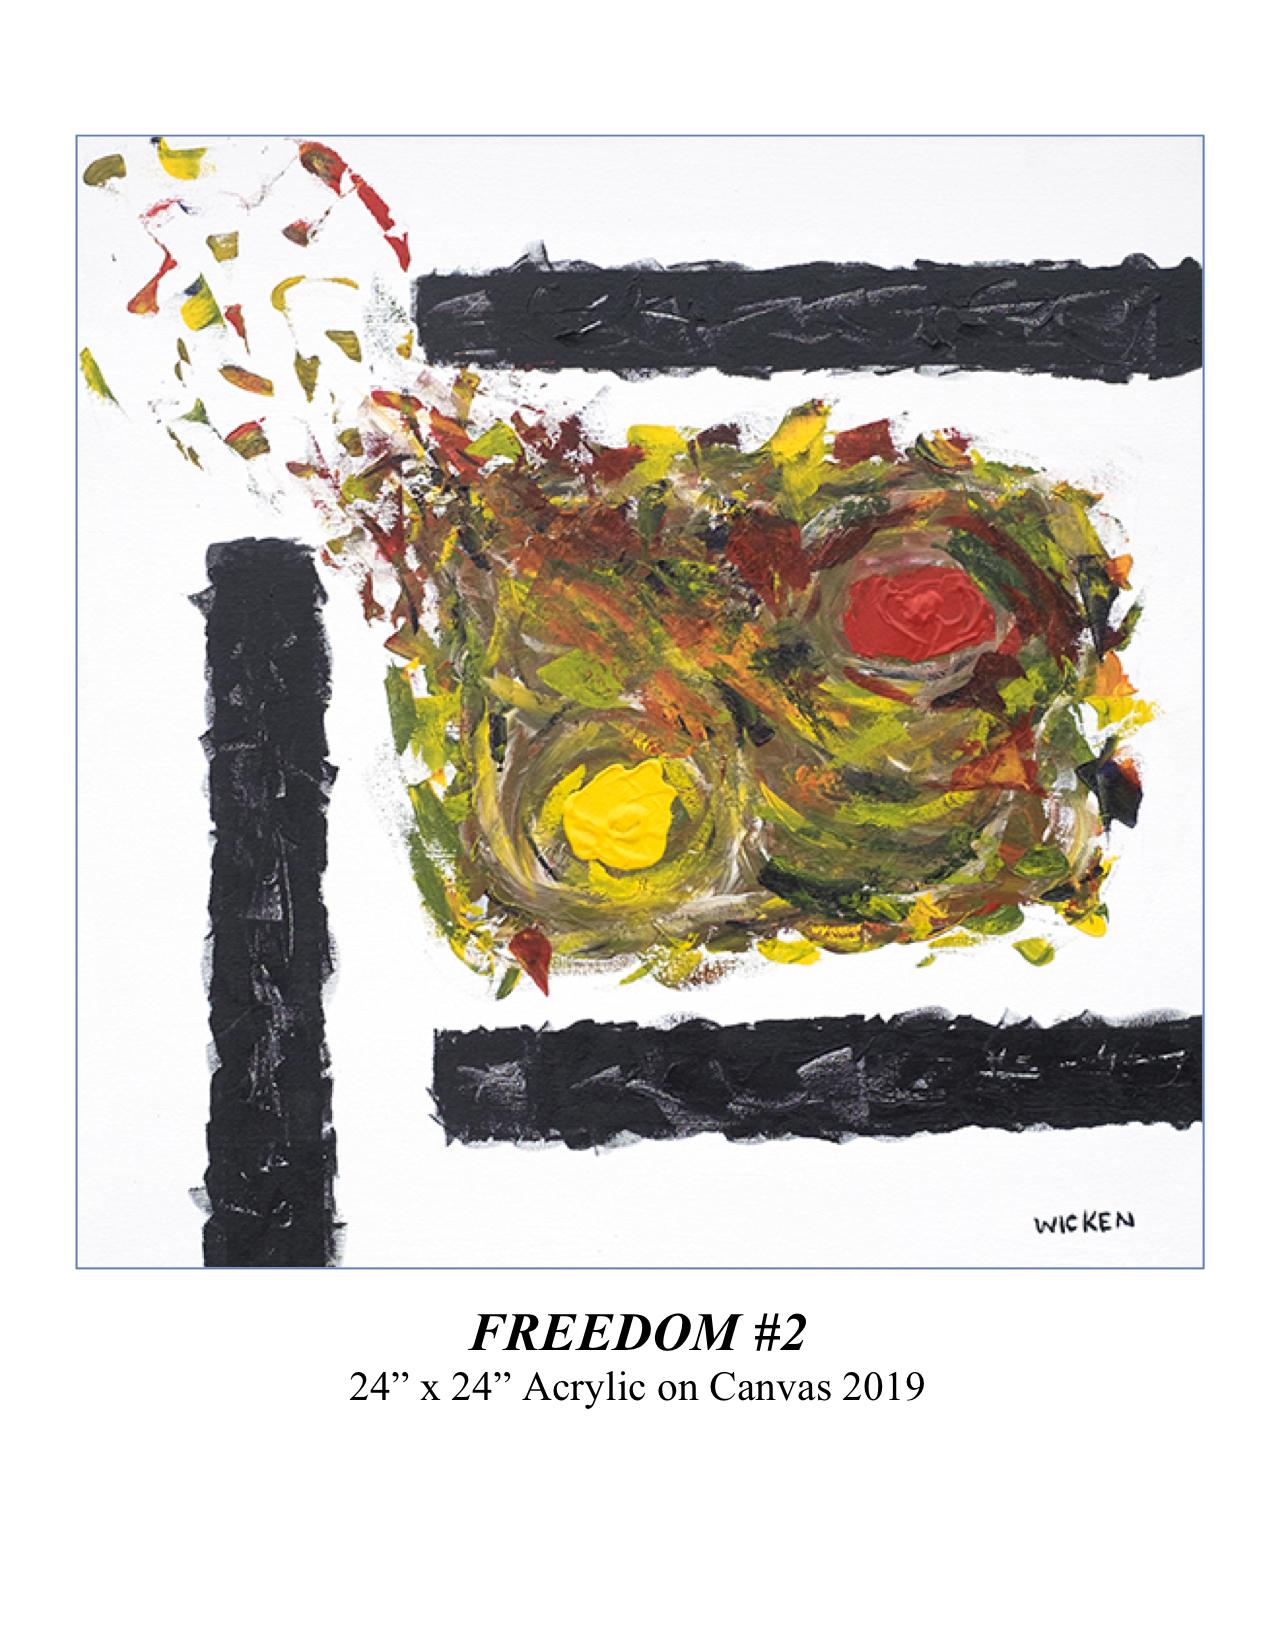 FREEDOM #2 0016.jpg